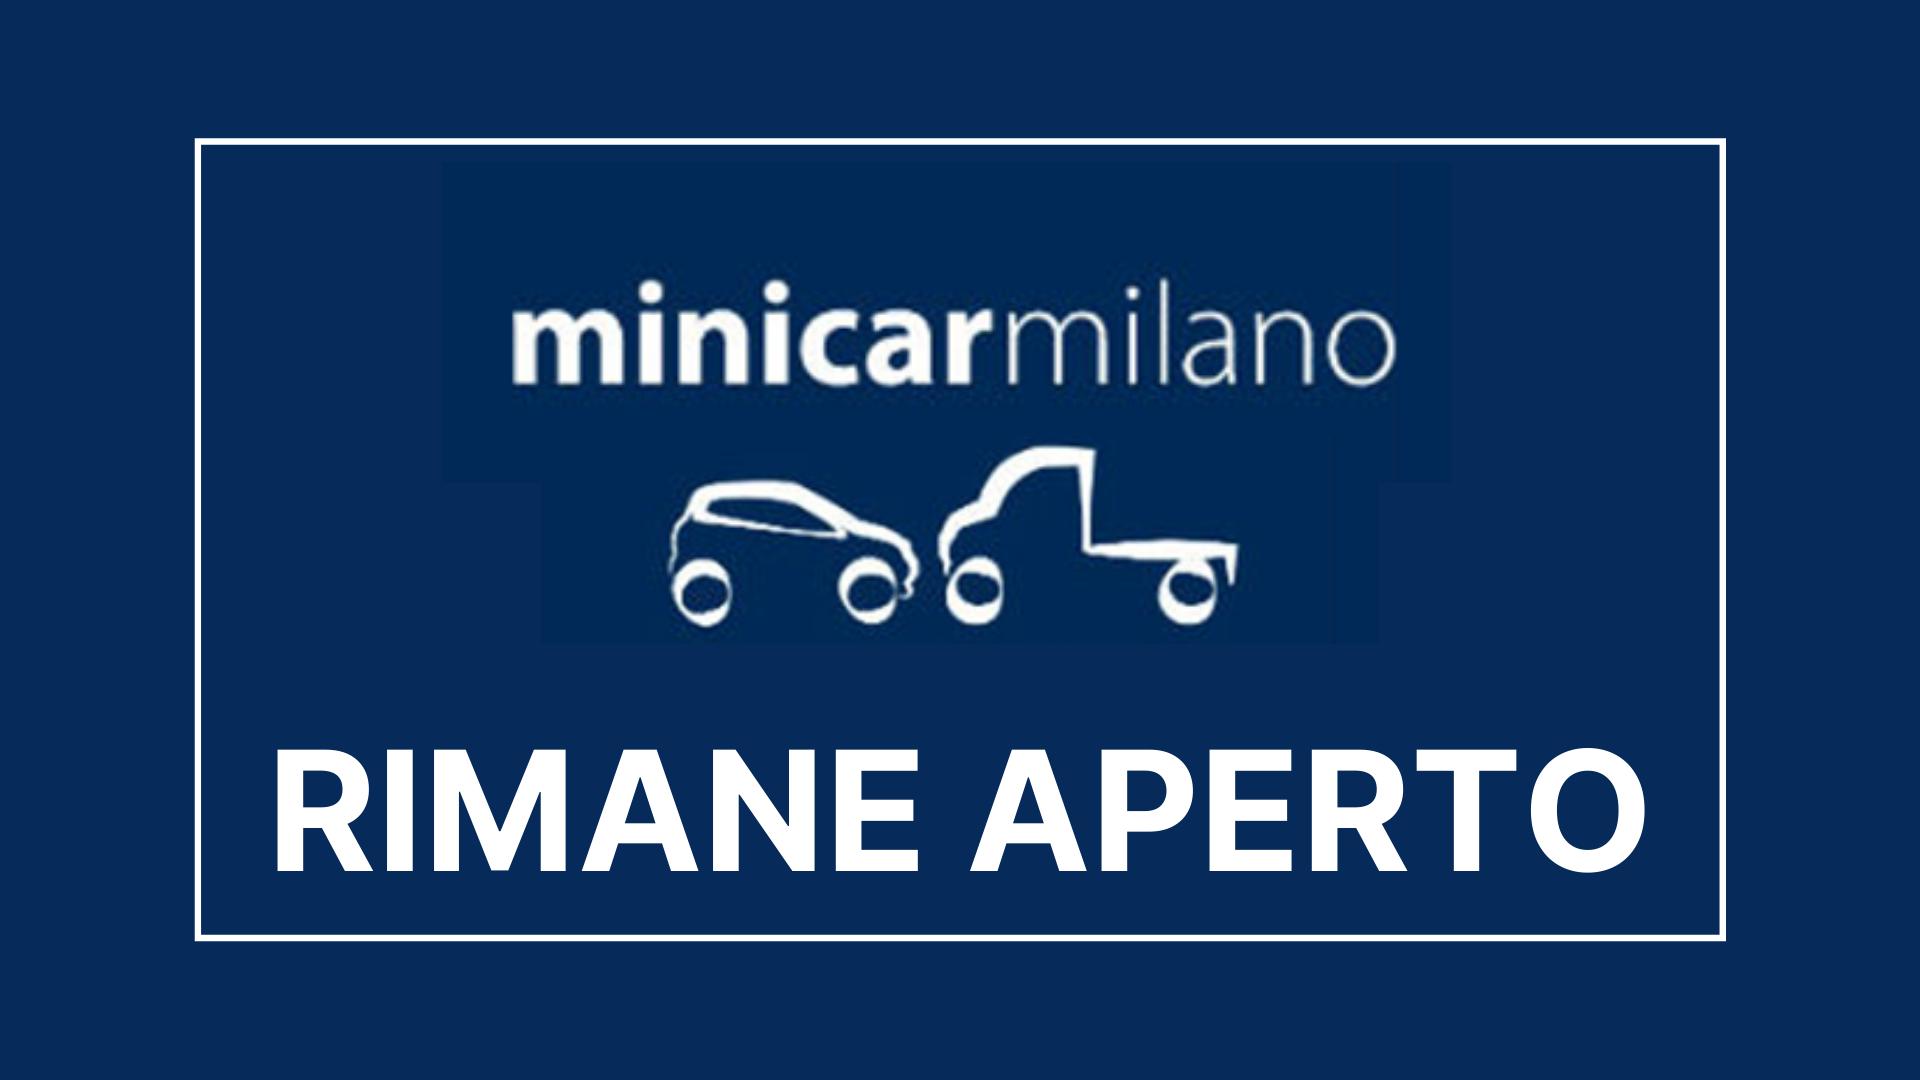 Minicarmilano rimane aperto in base al dpcm del 4 Novembre 2020